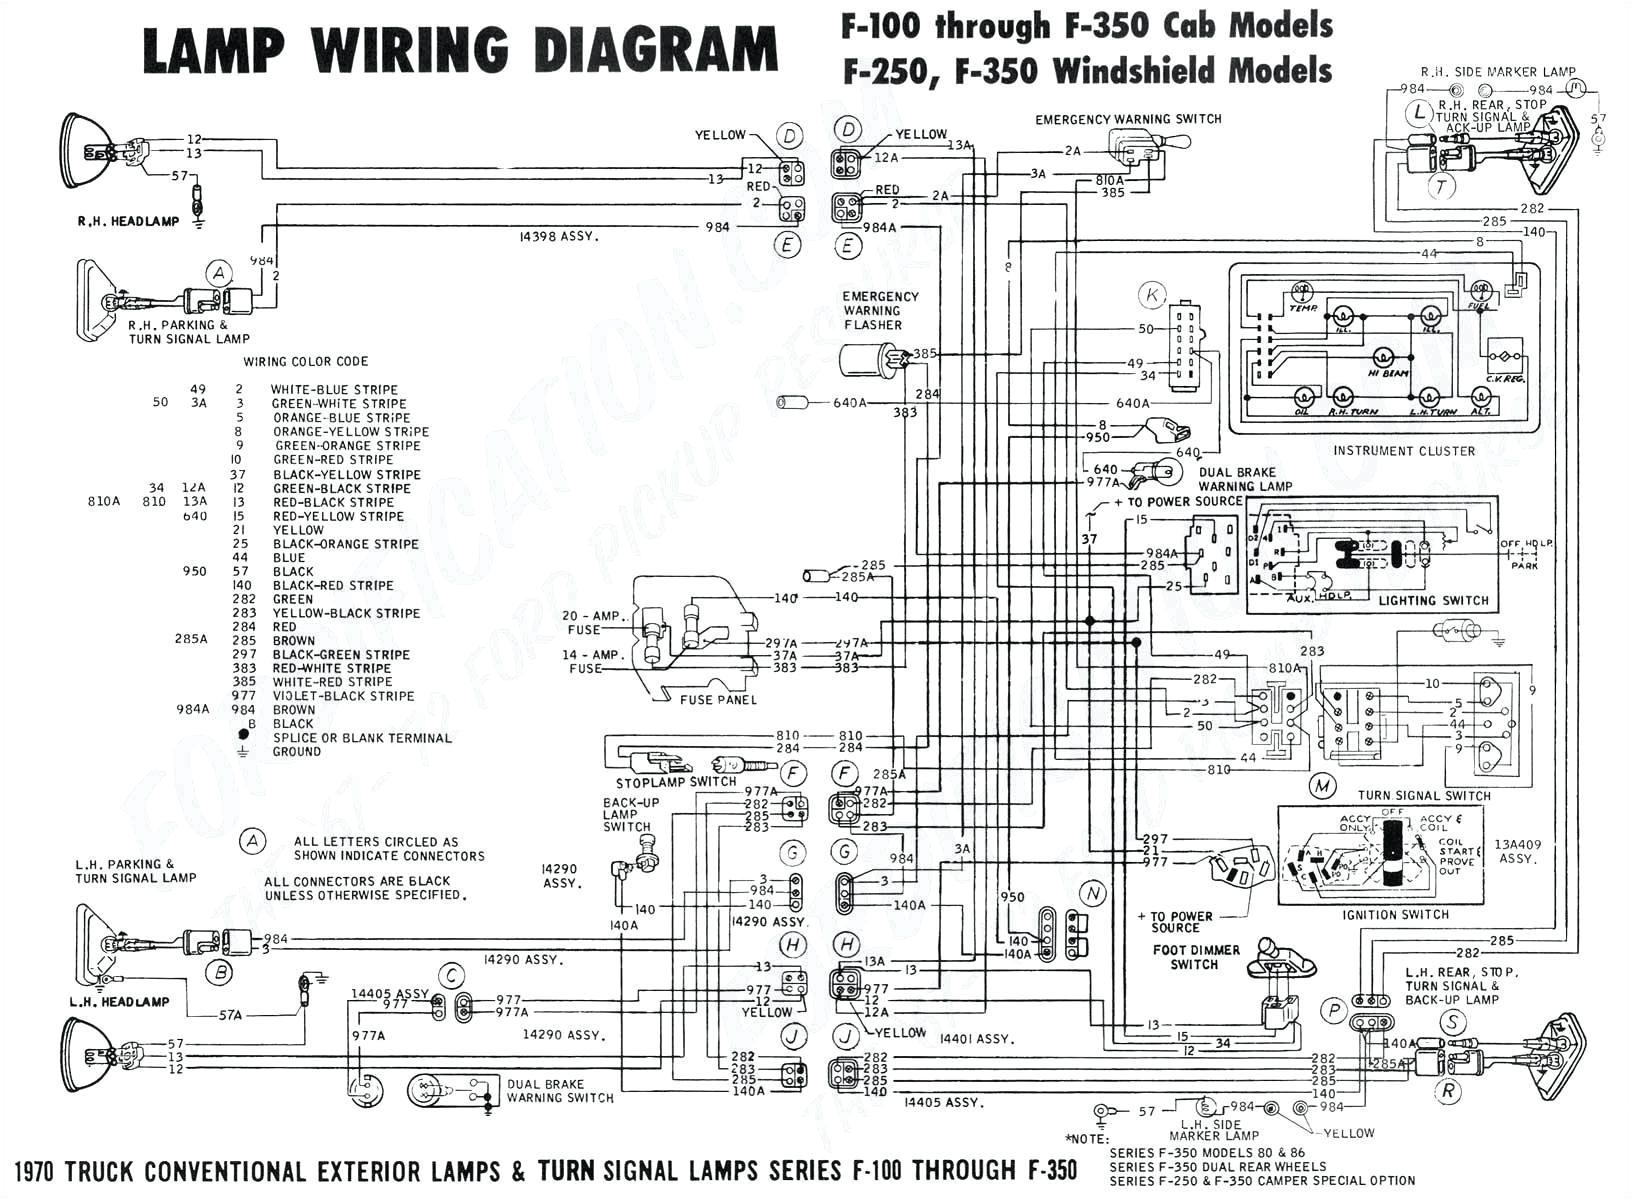 dod wiring diagram wiring diagram dod juice box wiring diagram wiring diagram database mix dod juice